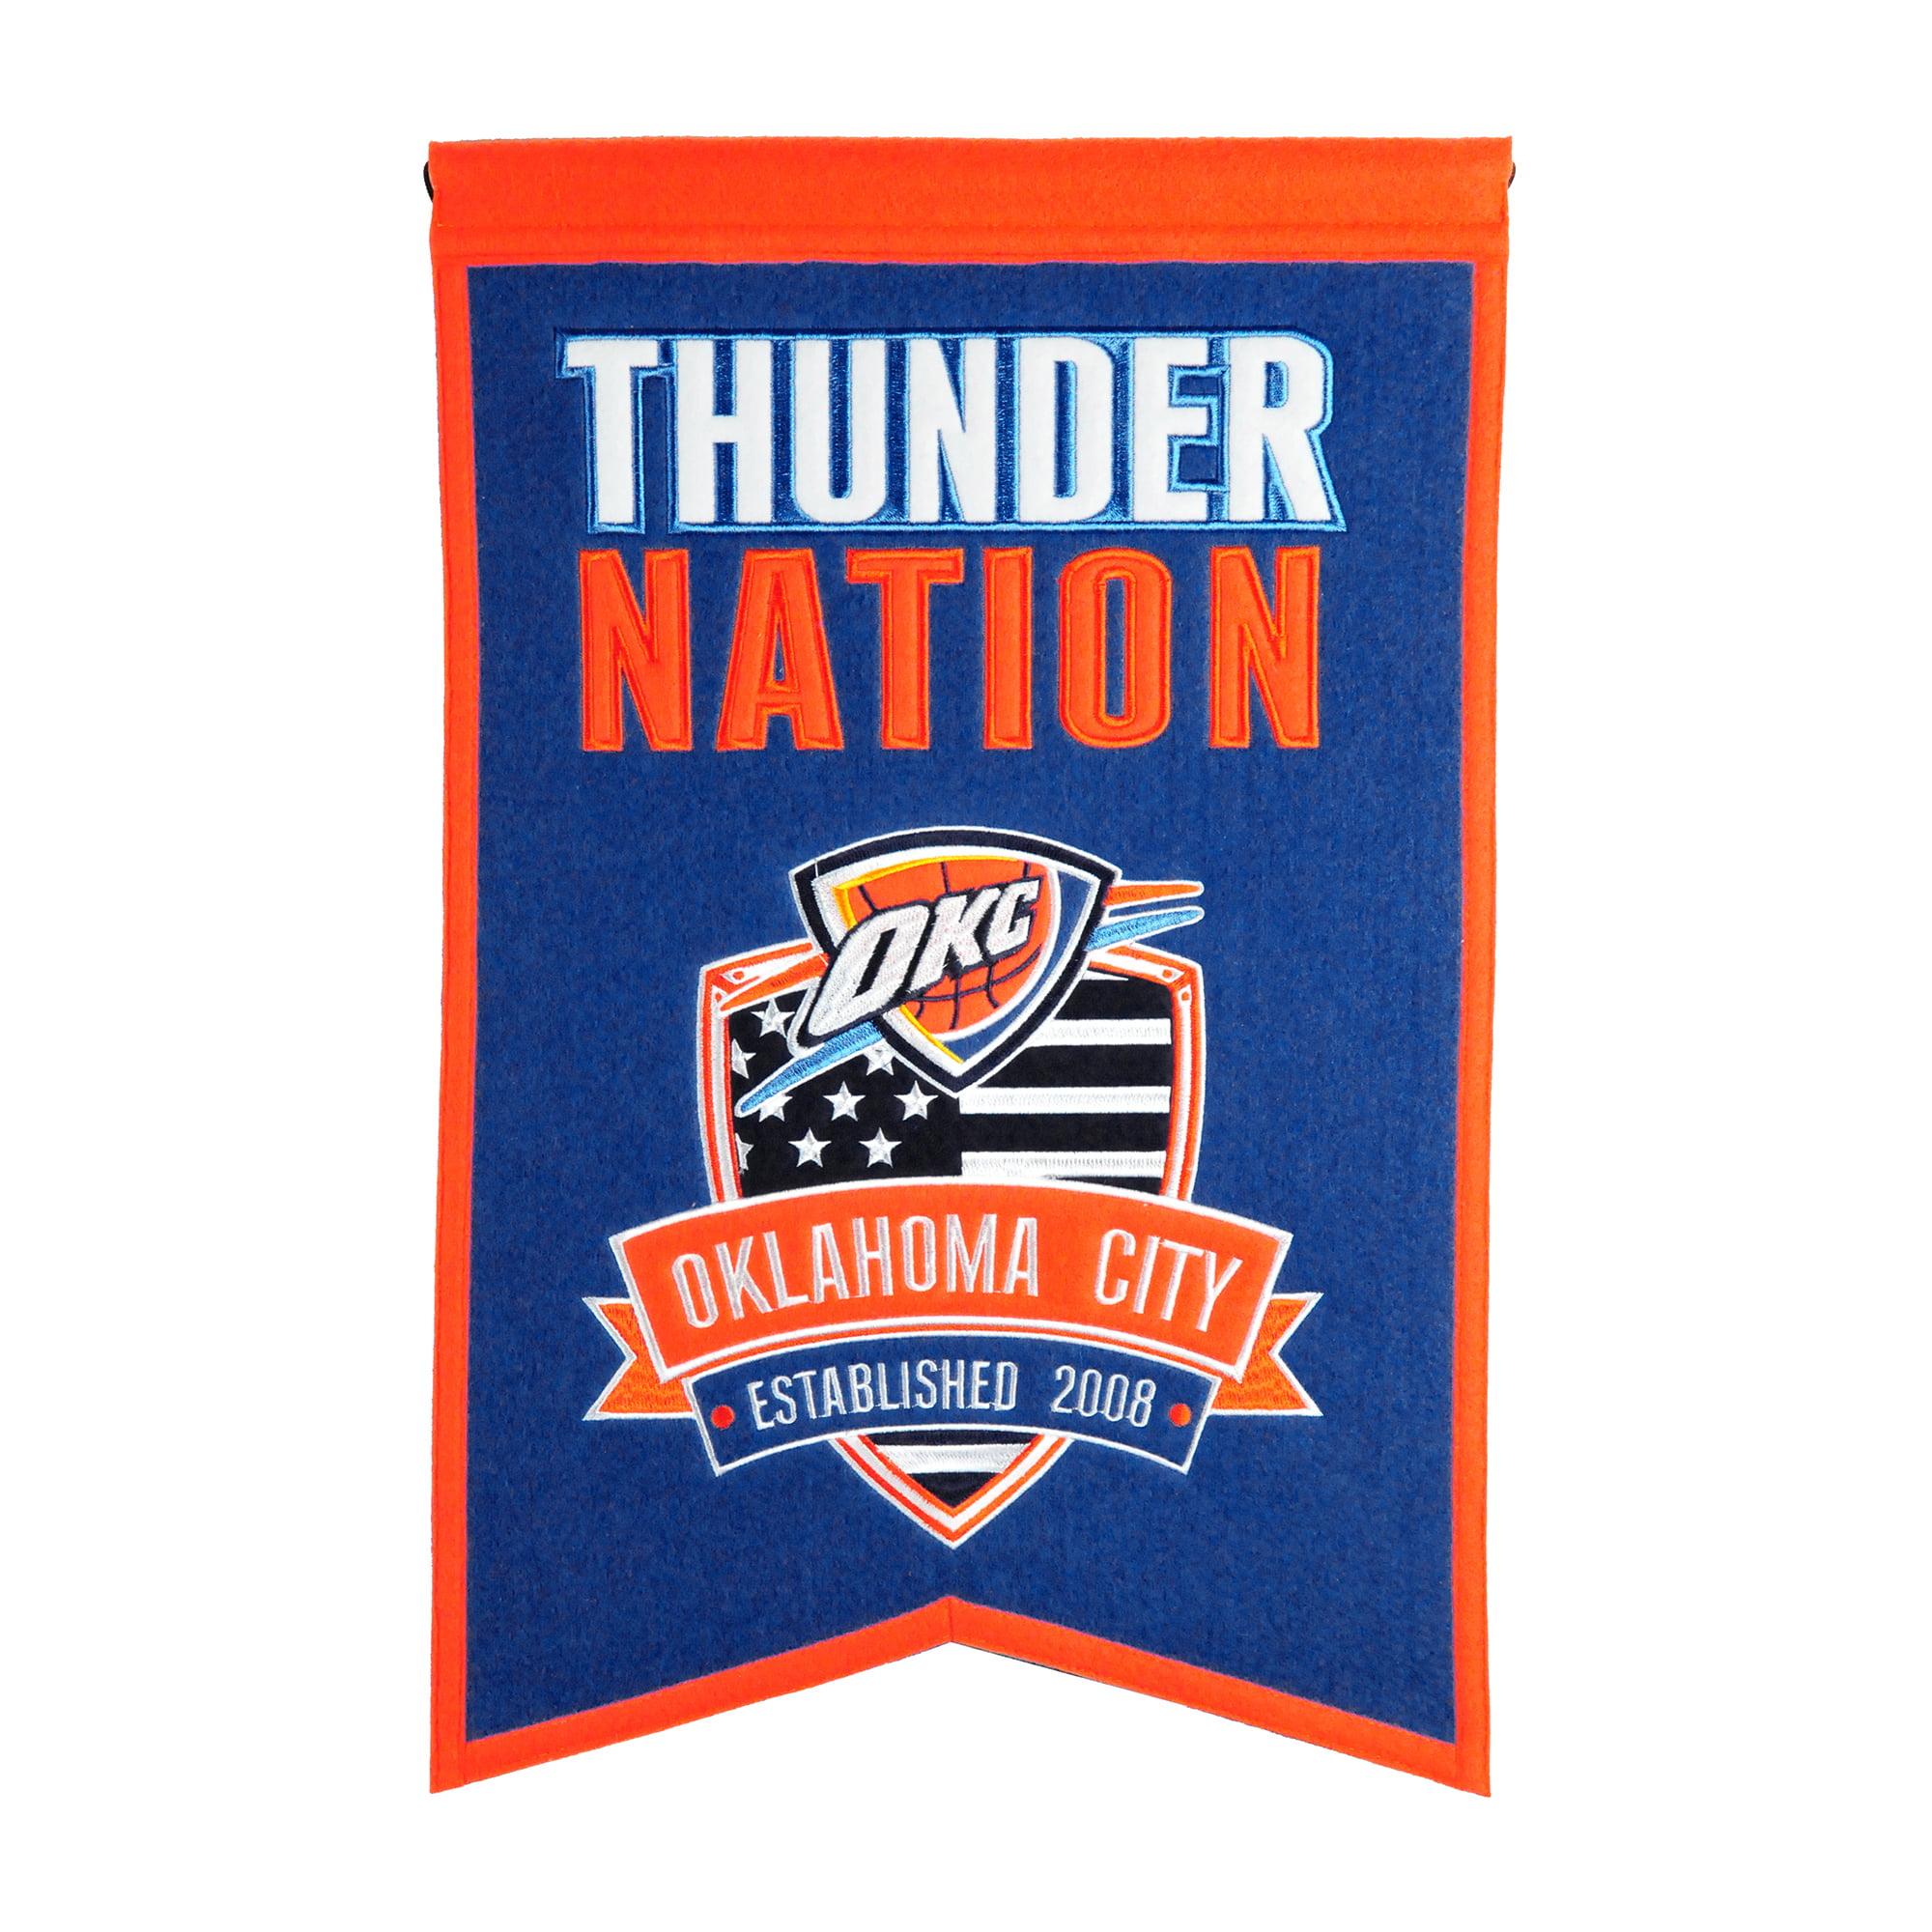 "Oklahoma City Thunder 14"" x 22"" Nations Banner - No Size"